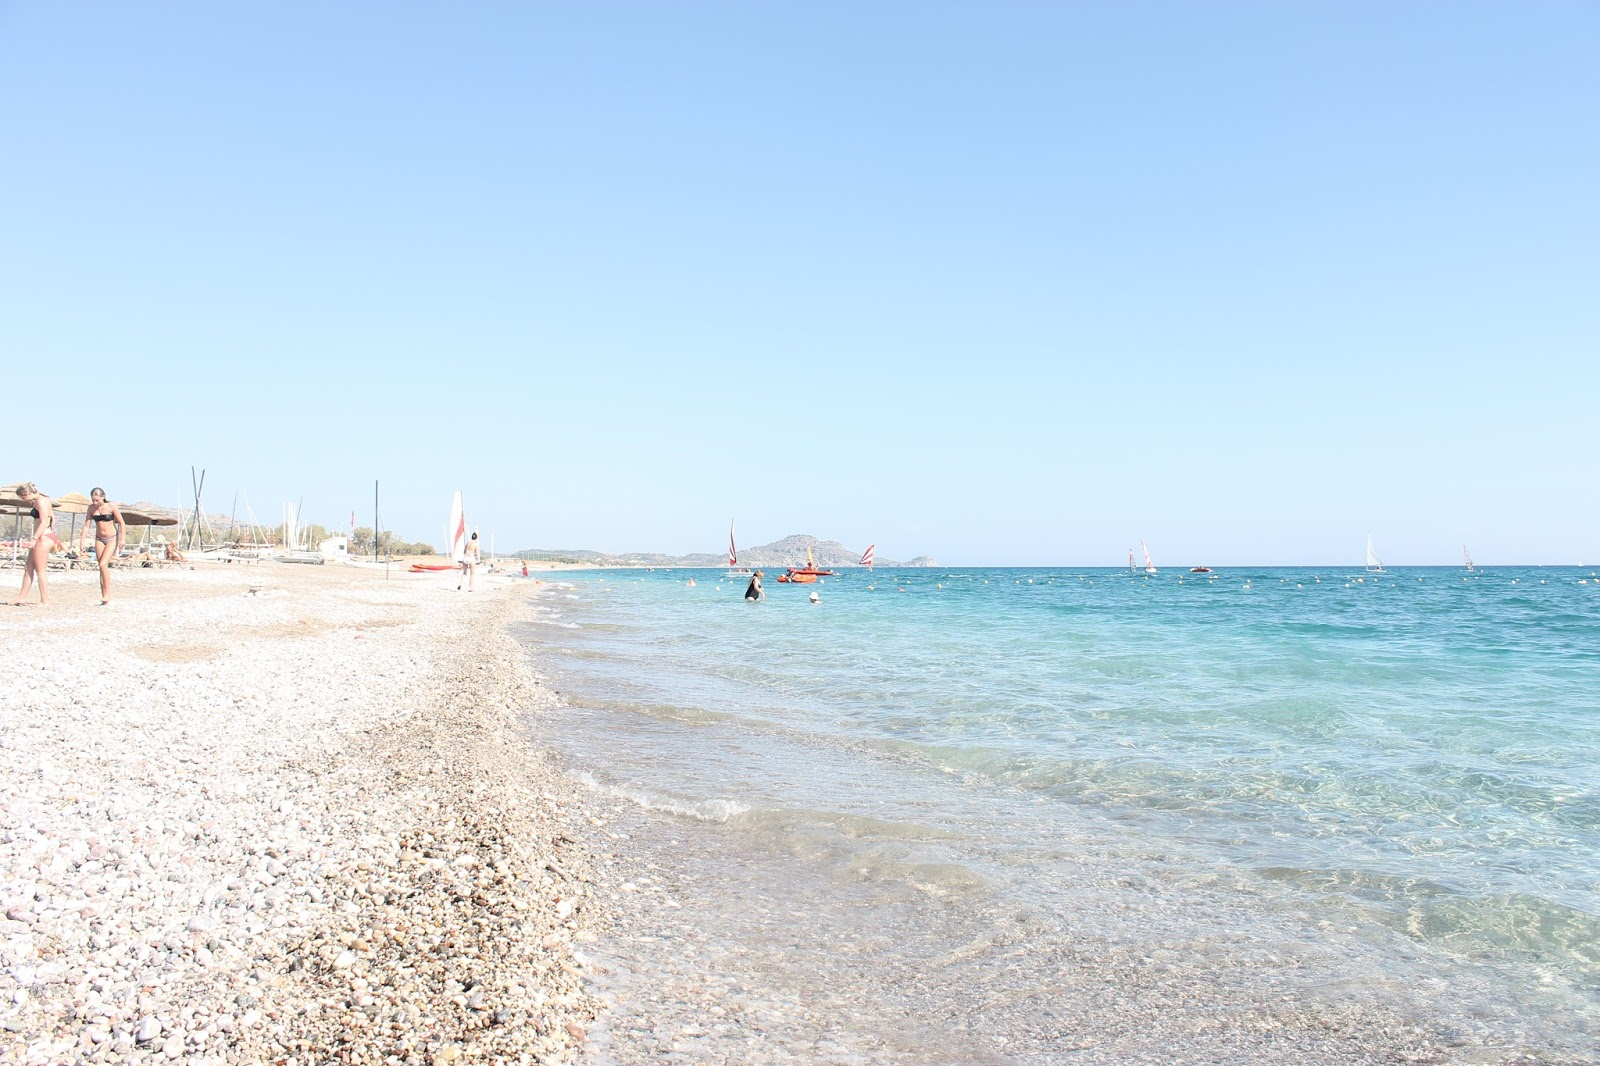 Levante Beach Hotel, Hotel Levante, Rhodes, Greece, Mark Warner Rhodes, Hotel levante, Rhodes Review